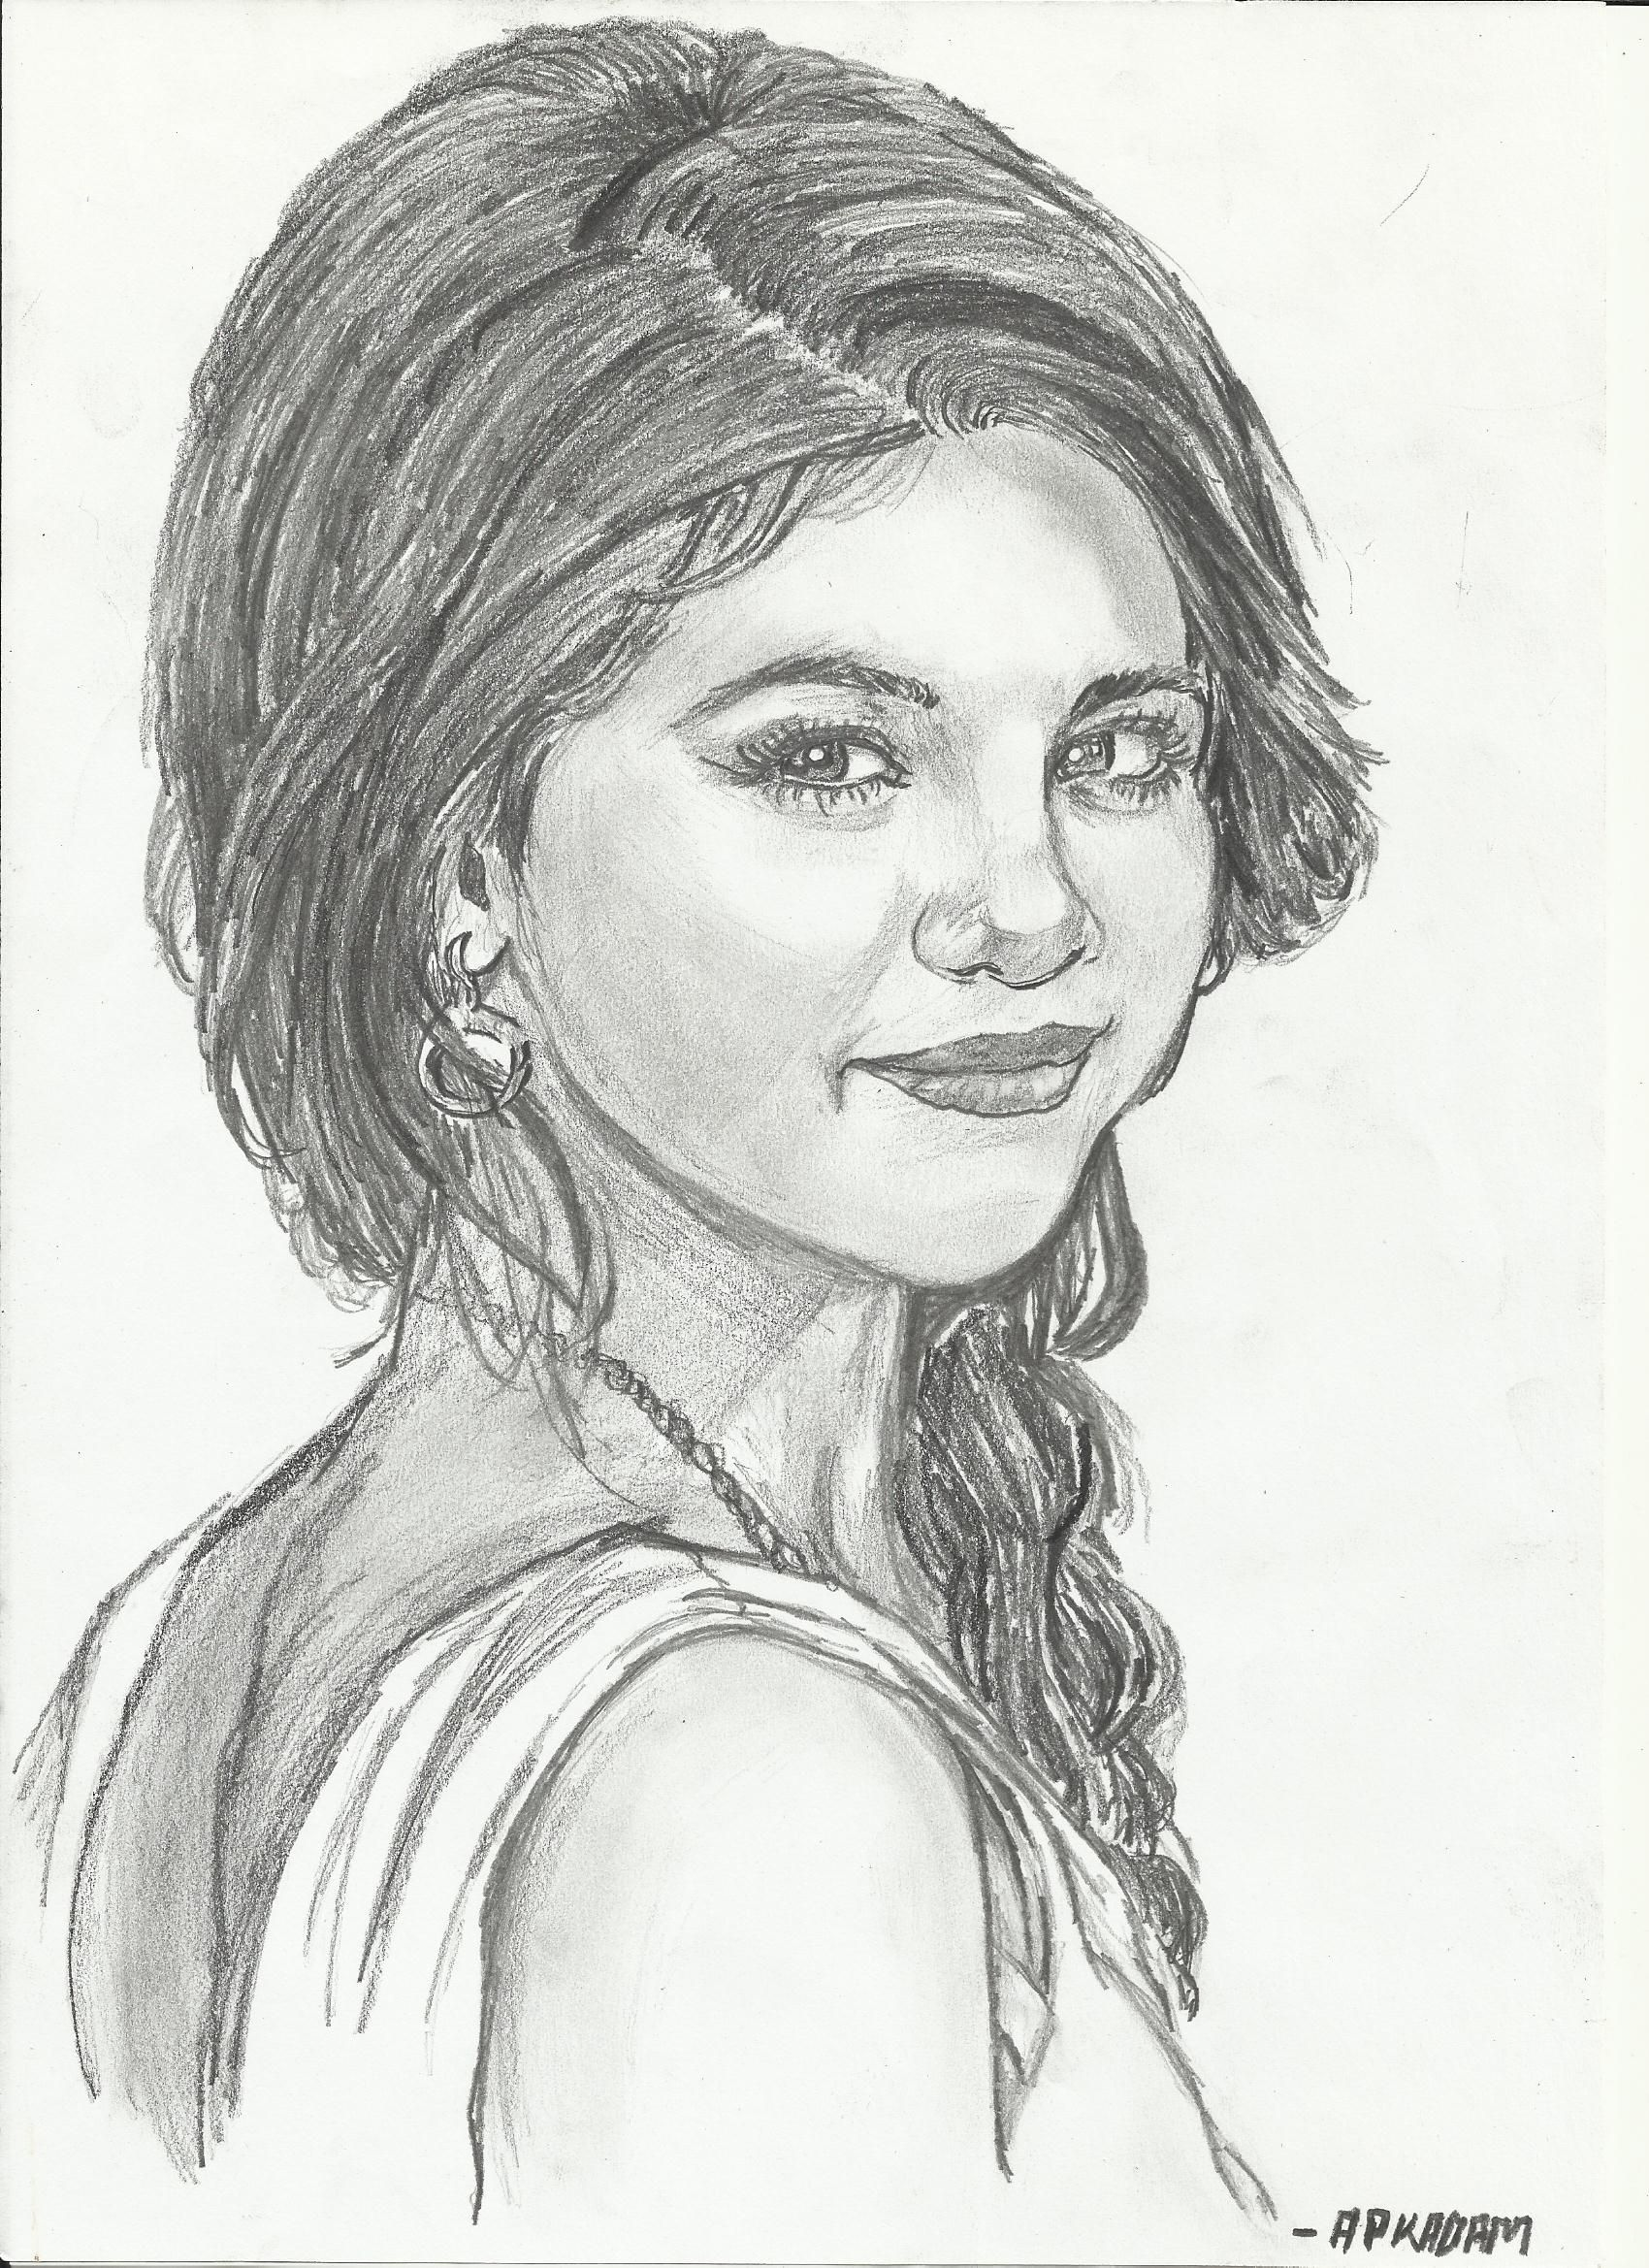 Selena Gomez Pencil Sketch made by me | Sketches, Fashion ...